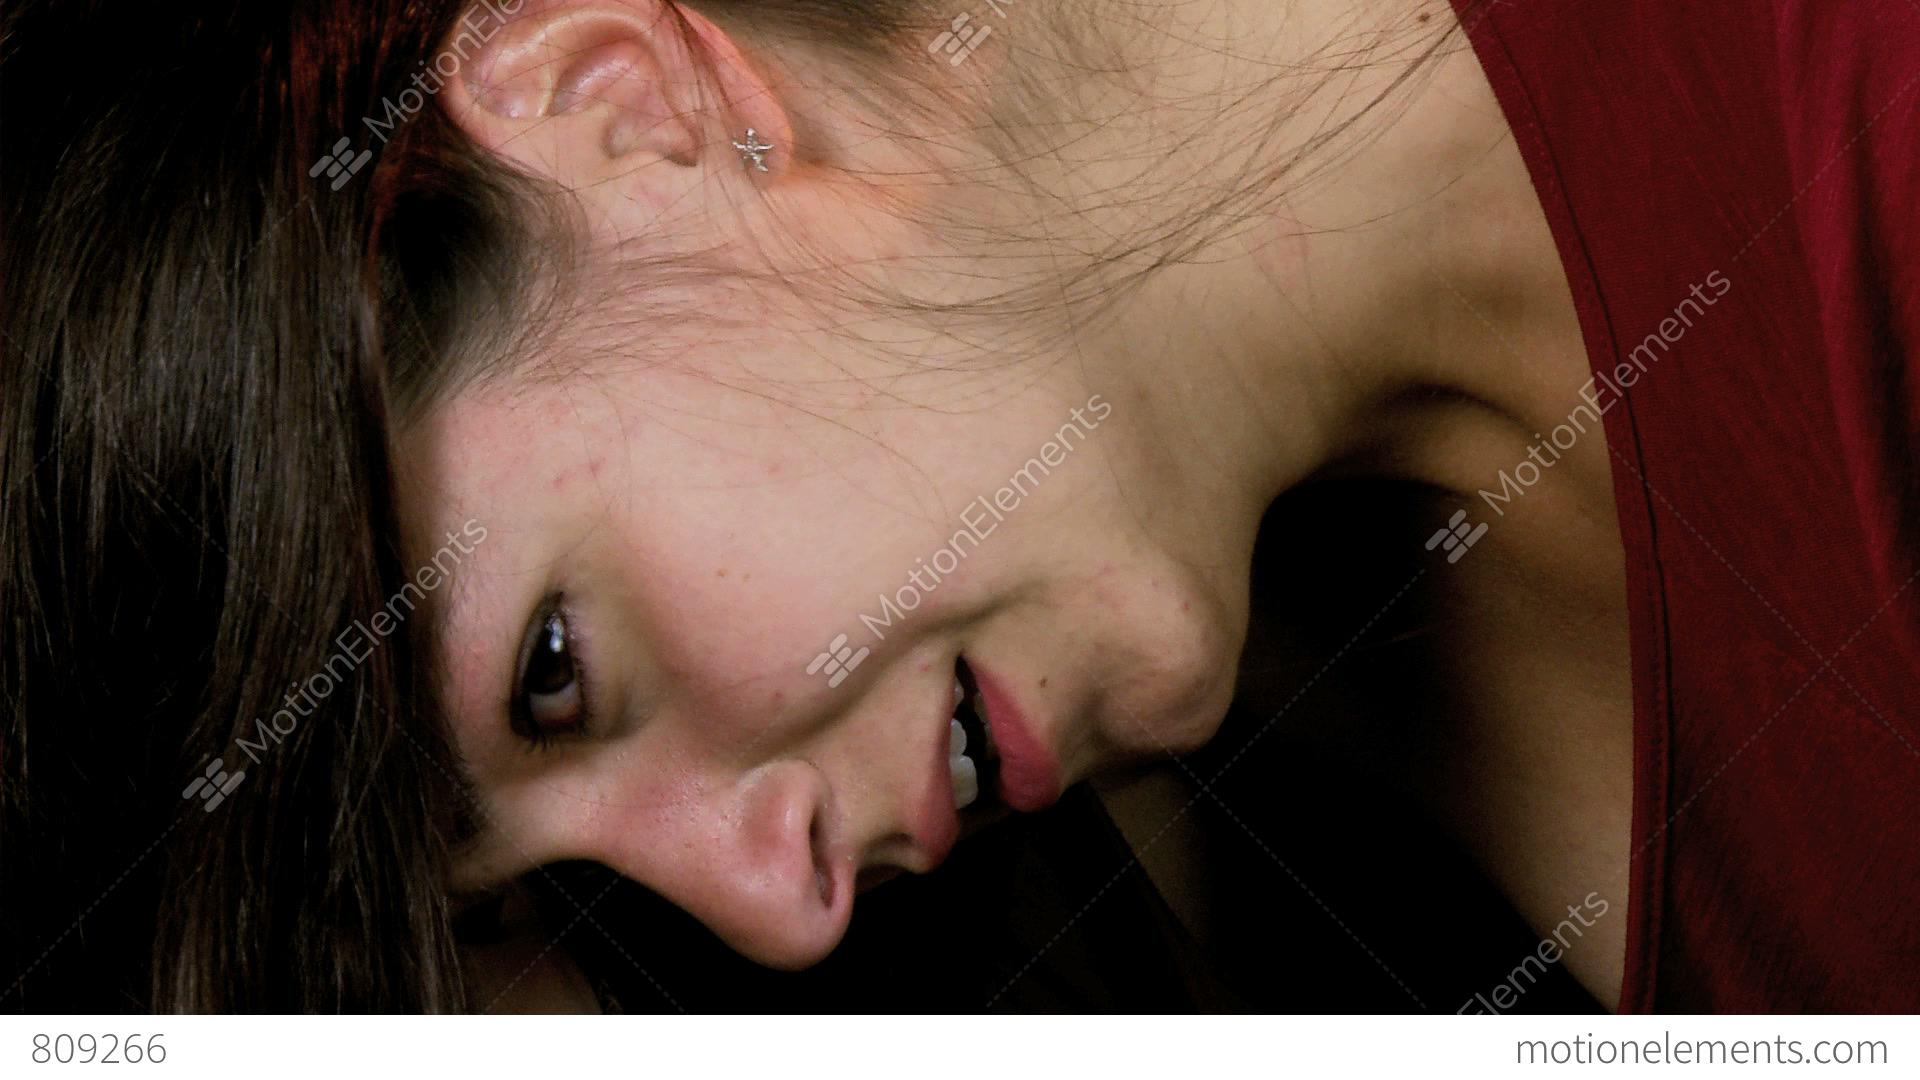 Very sad girl crying 809266 - Sad girl pictures crying ...